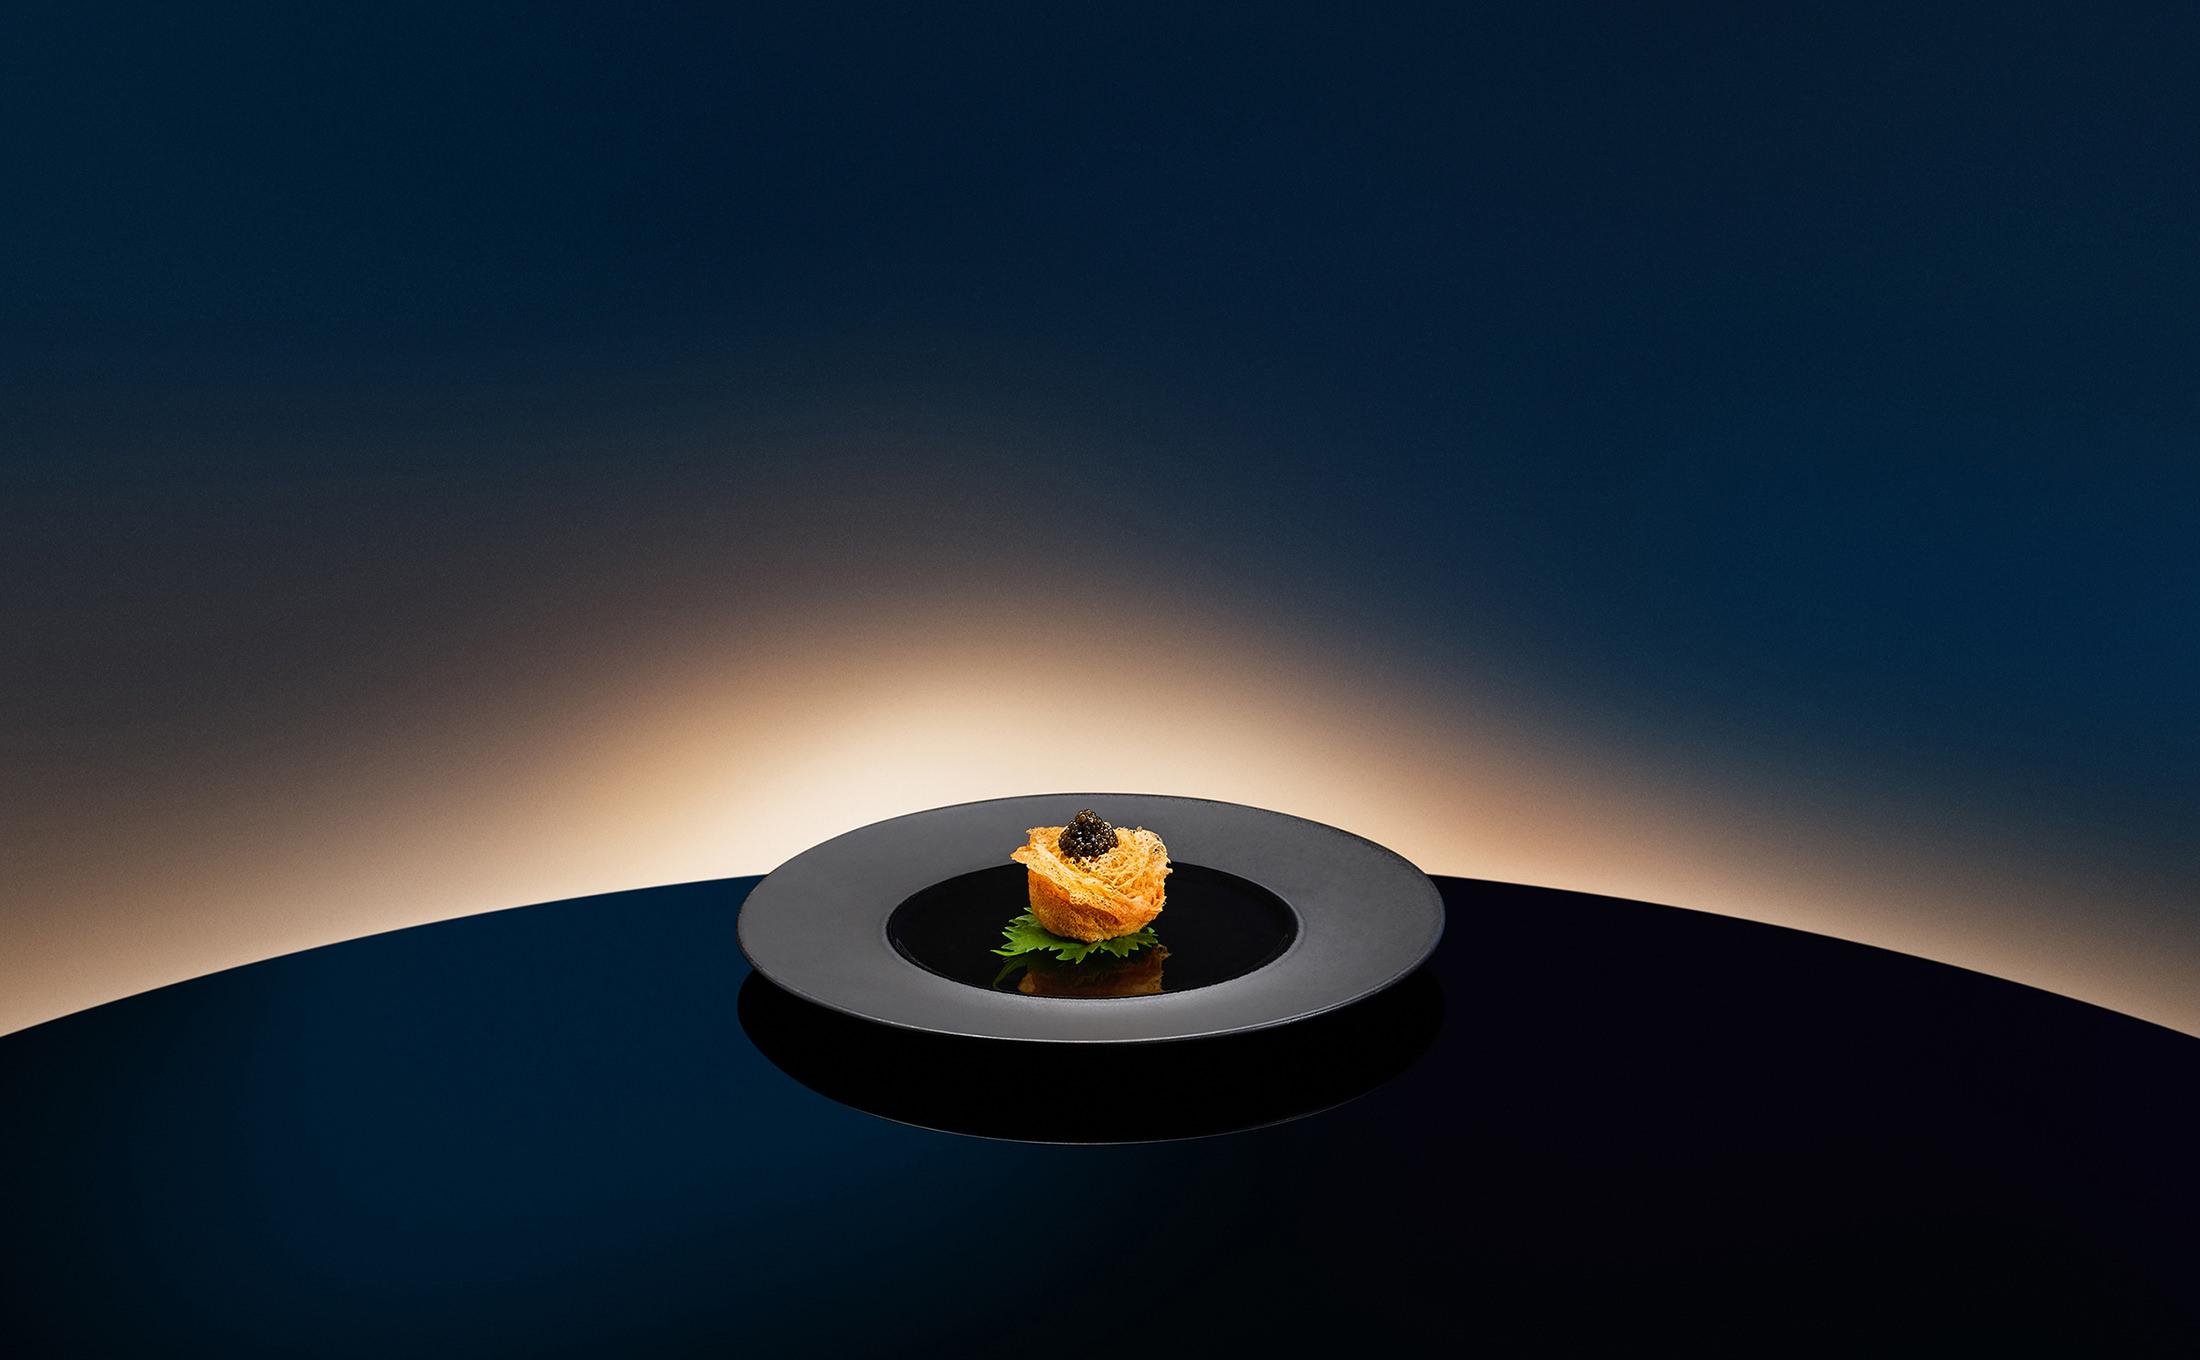 Deep Fried Taro, Scallop, Chicken, Black Caviar by Chef Cheung Siu Kong.jpg